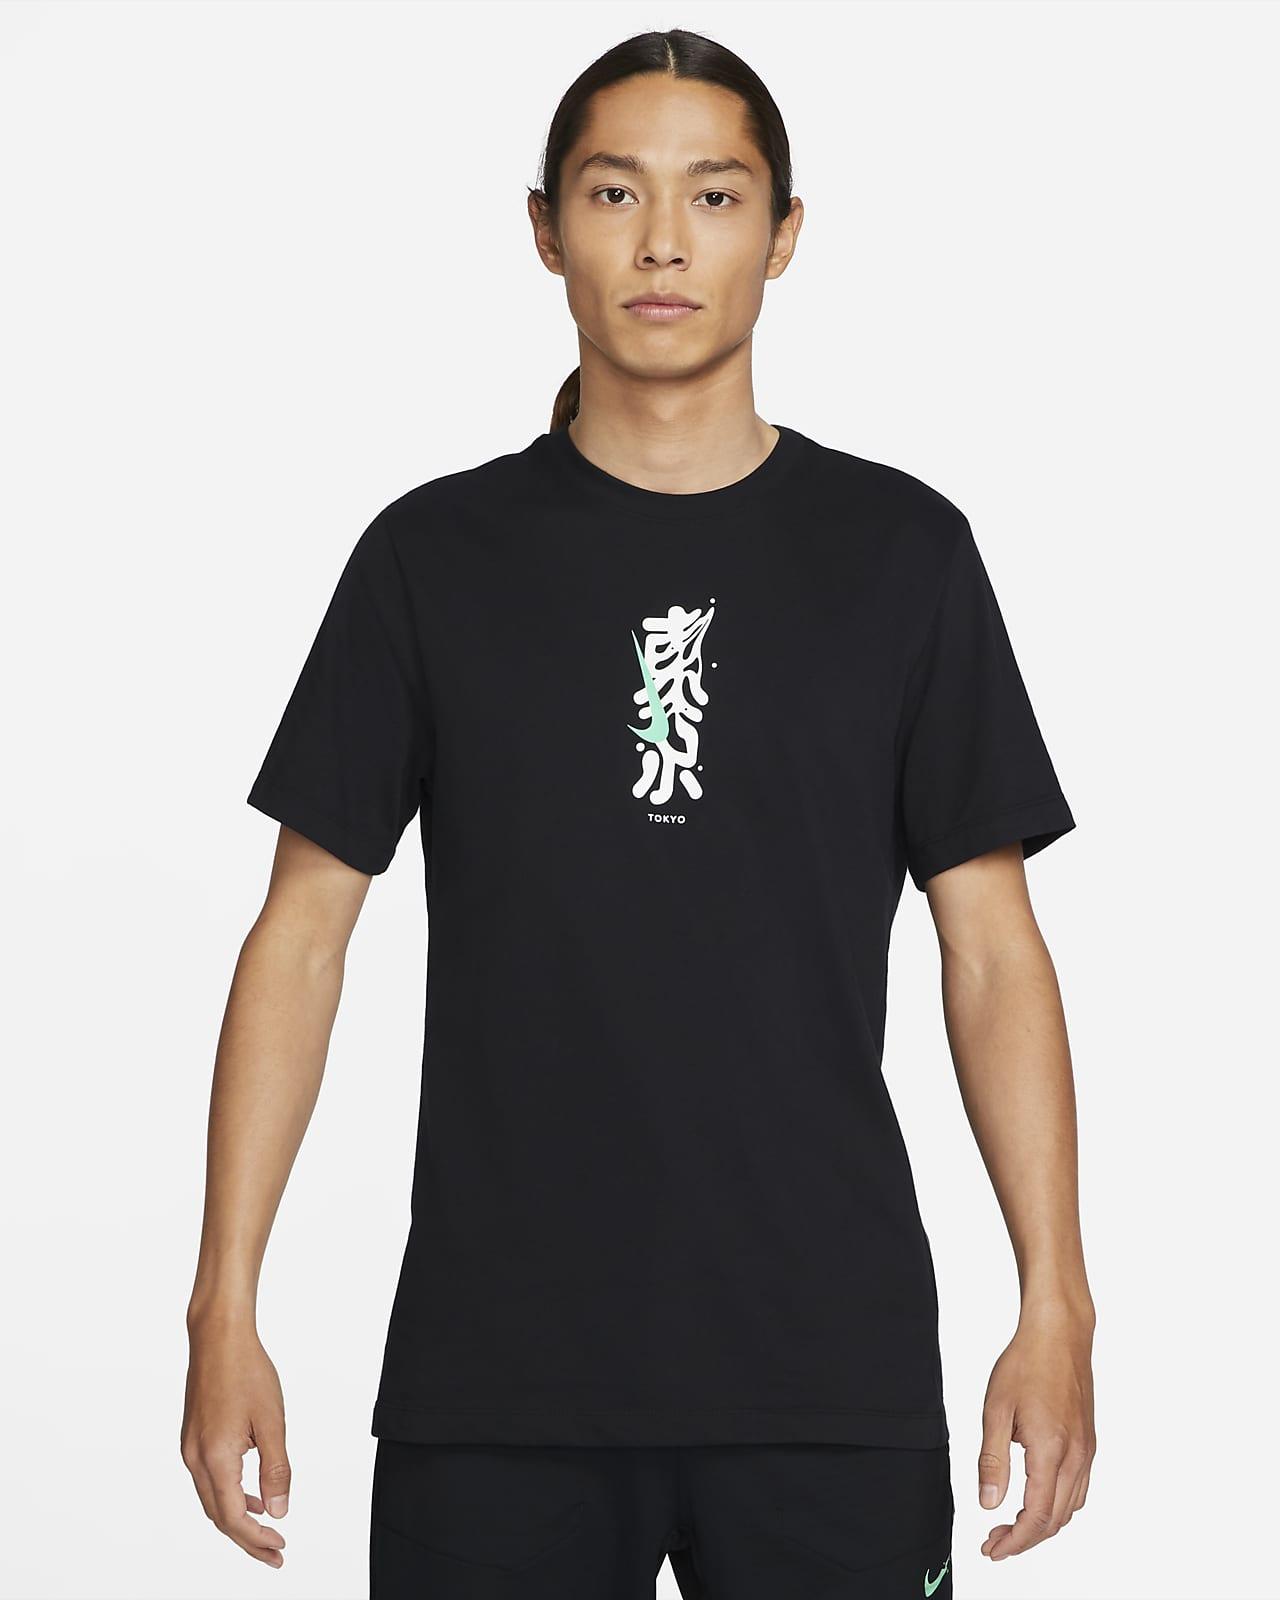 Nike Dri-FIT Tokyo Running T-Shirt